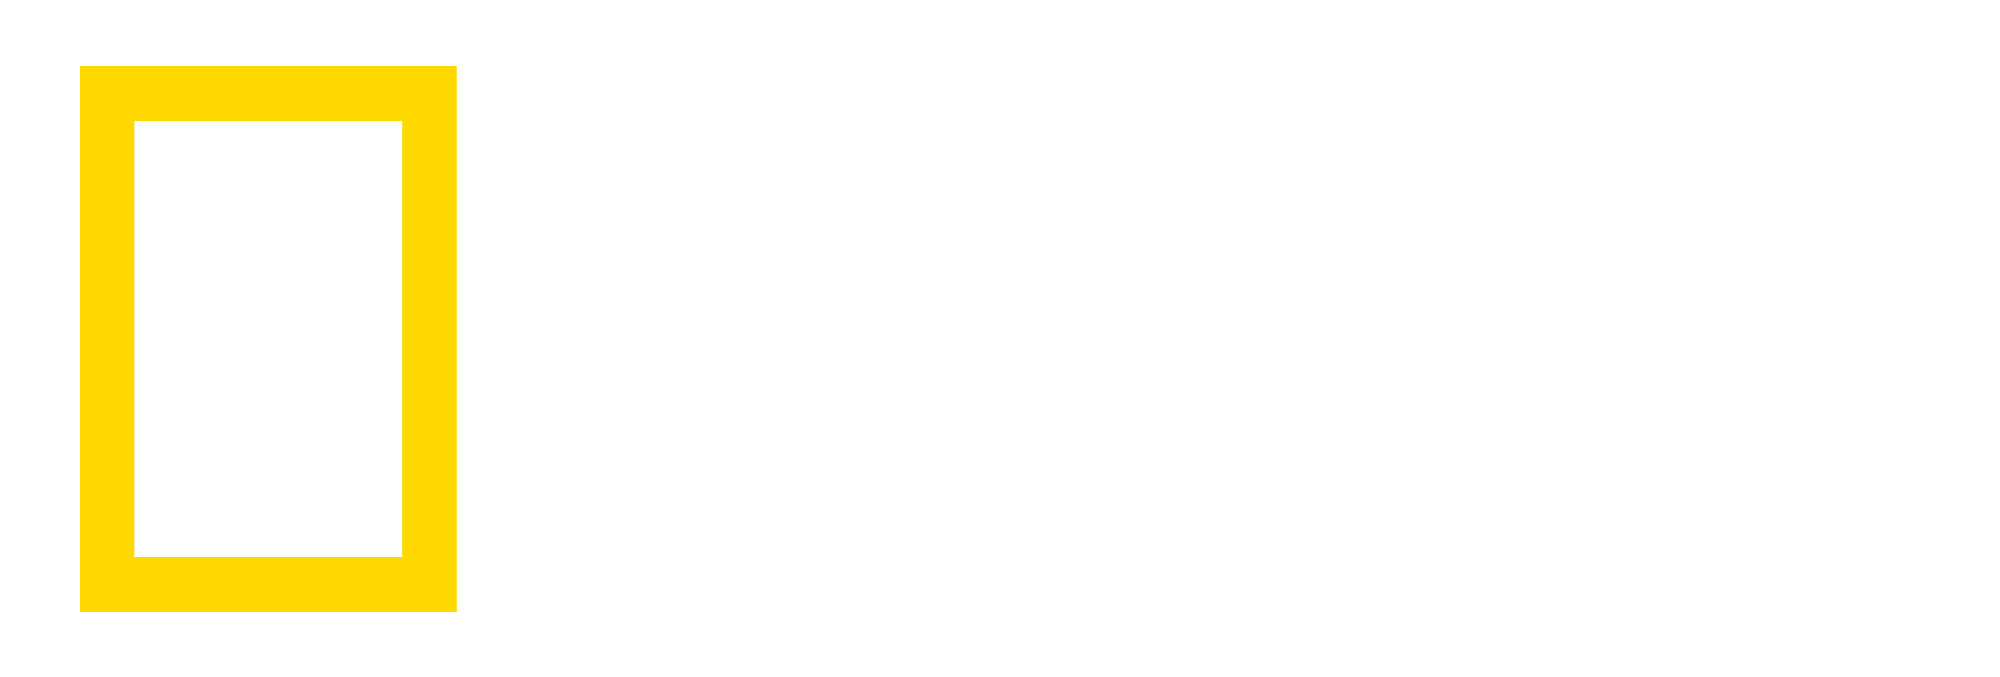 NG_LOGO_white.png - Logo National Geographic PNG